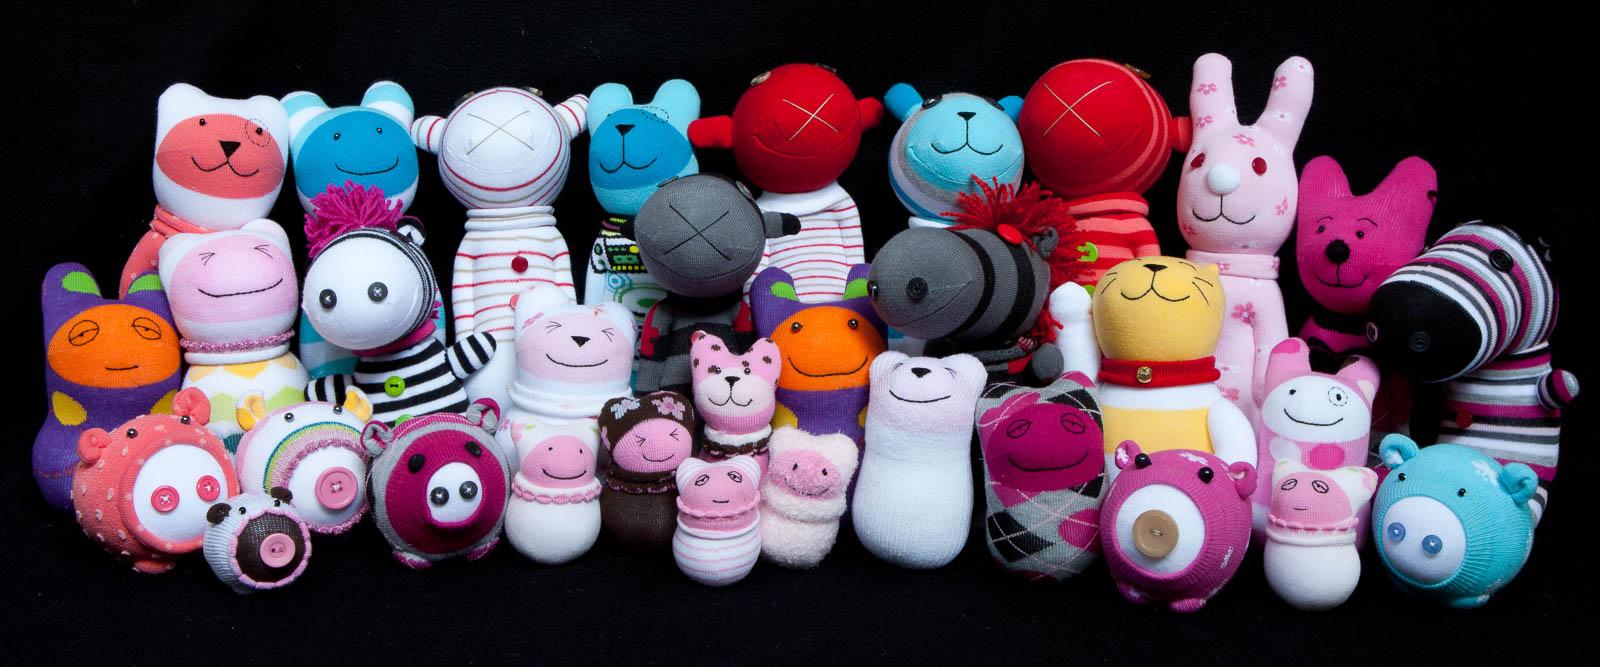 Sockbuddies_2010-1015_040.jpg